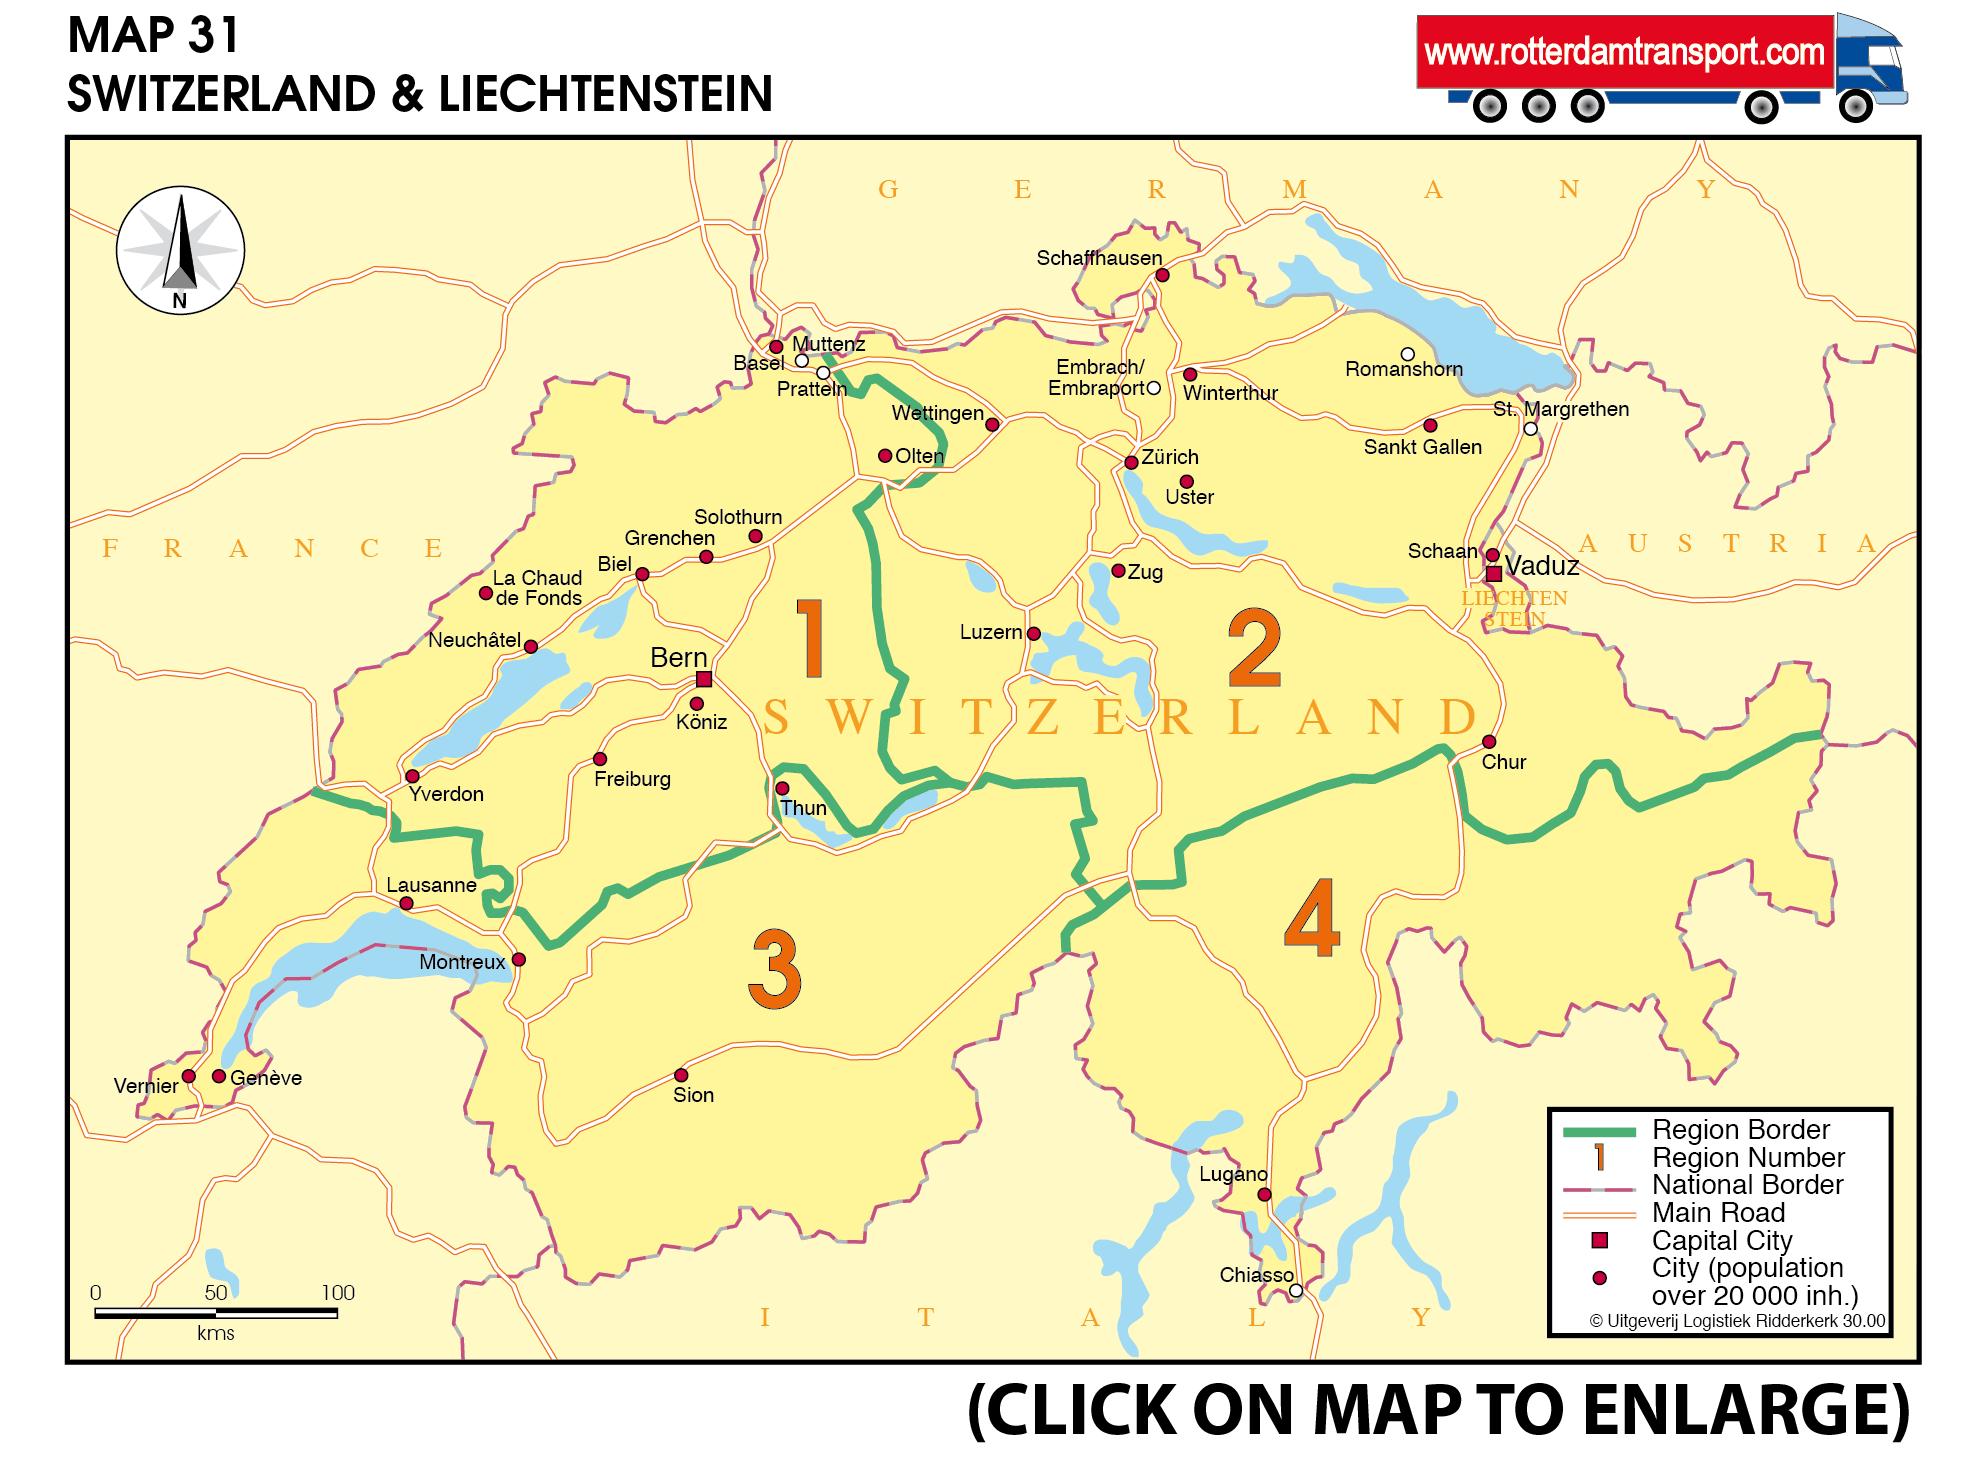 Wwwrotterdamtransportcom Maps Groupage By Road - Chur map